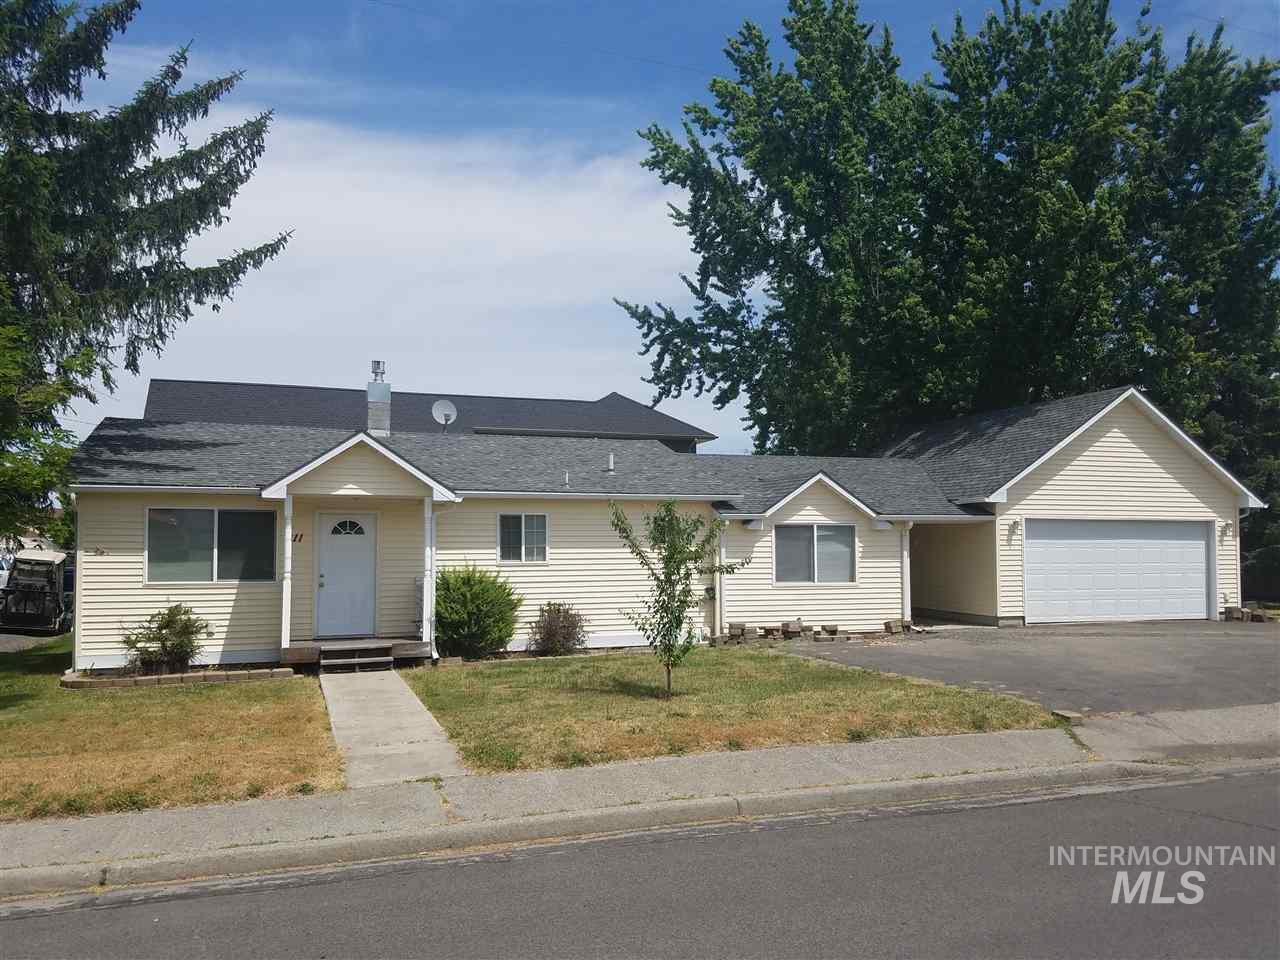 Single Family Home for Sale at 211 Madison 211 Madison Grangeville, Idaho 83530